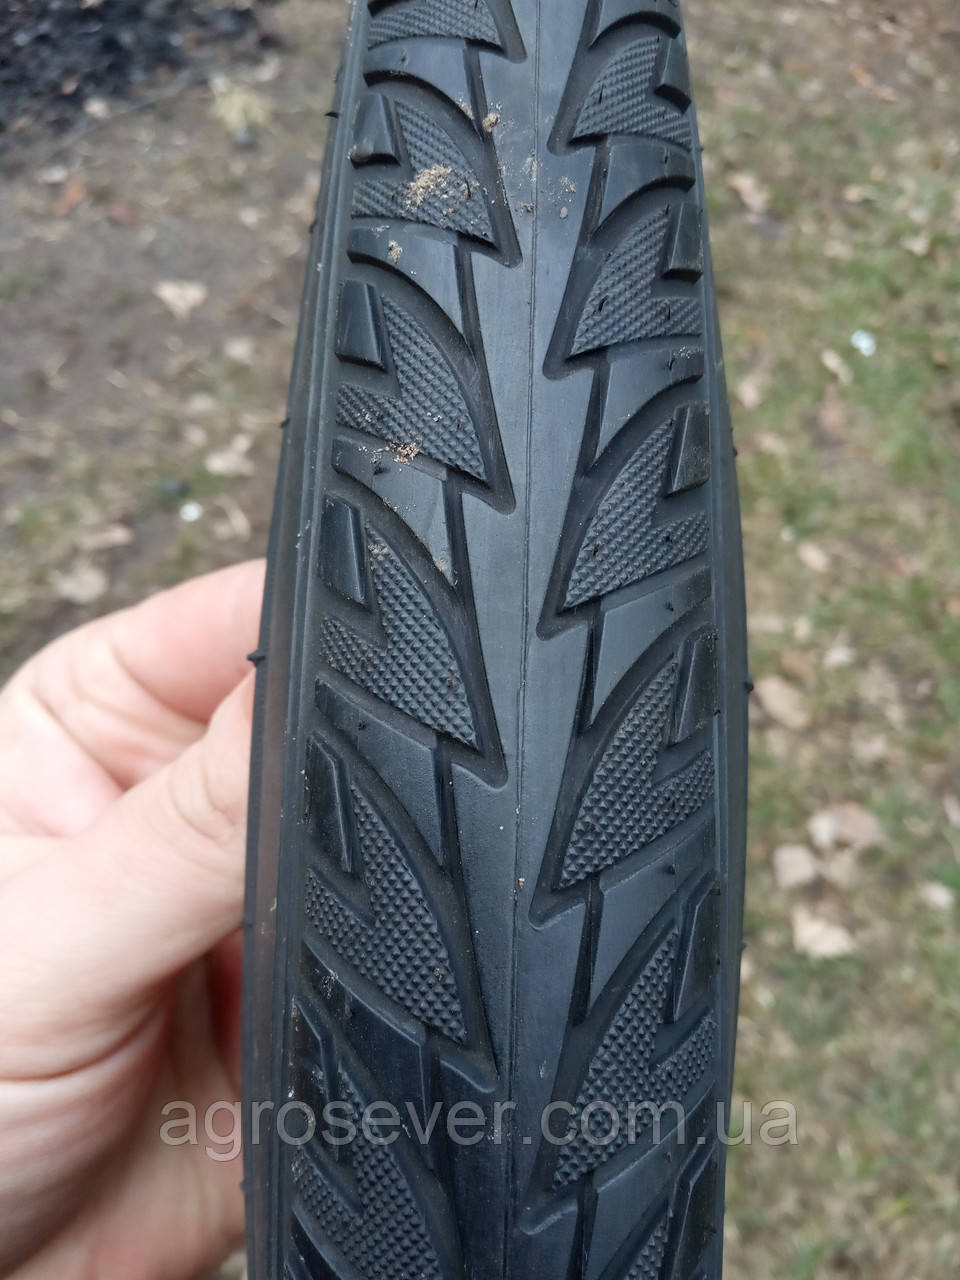 "Покришка для велосипеда 700x40C (44-622) 28"" SA-274 Label card Delitire"